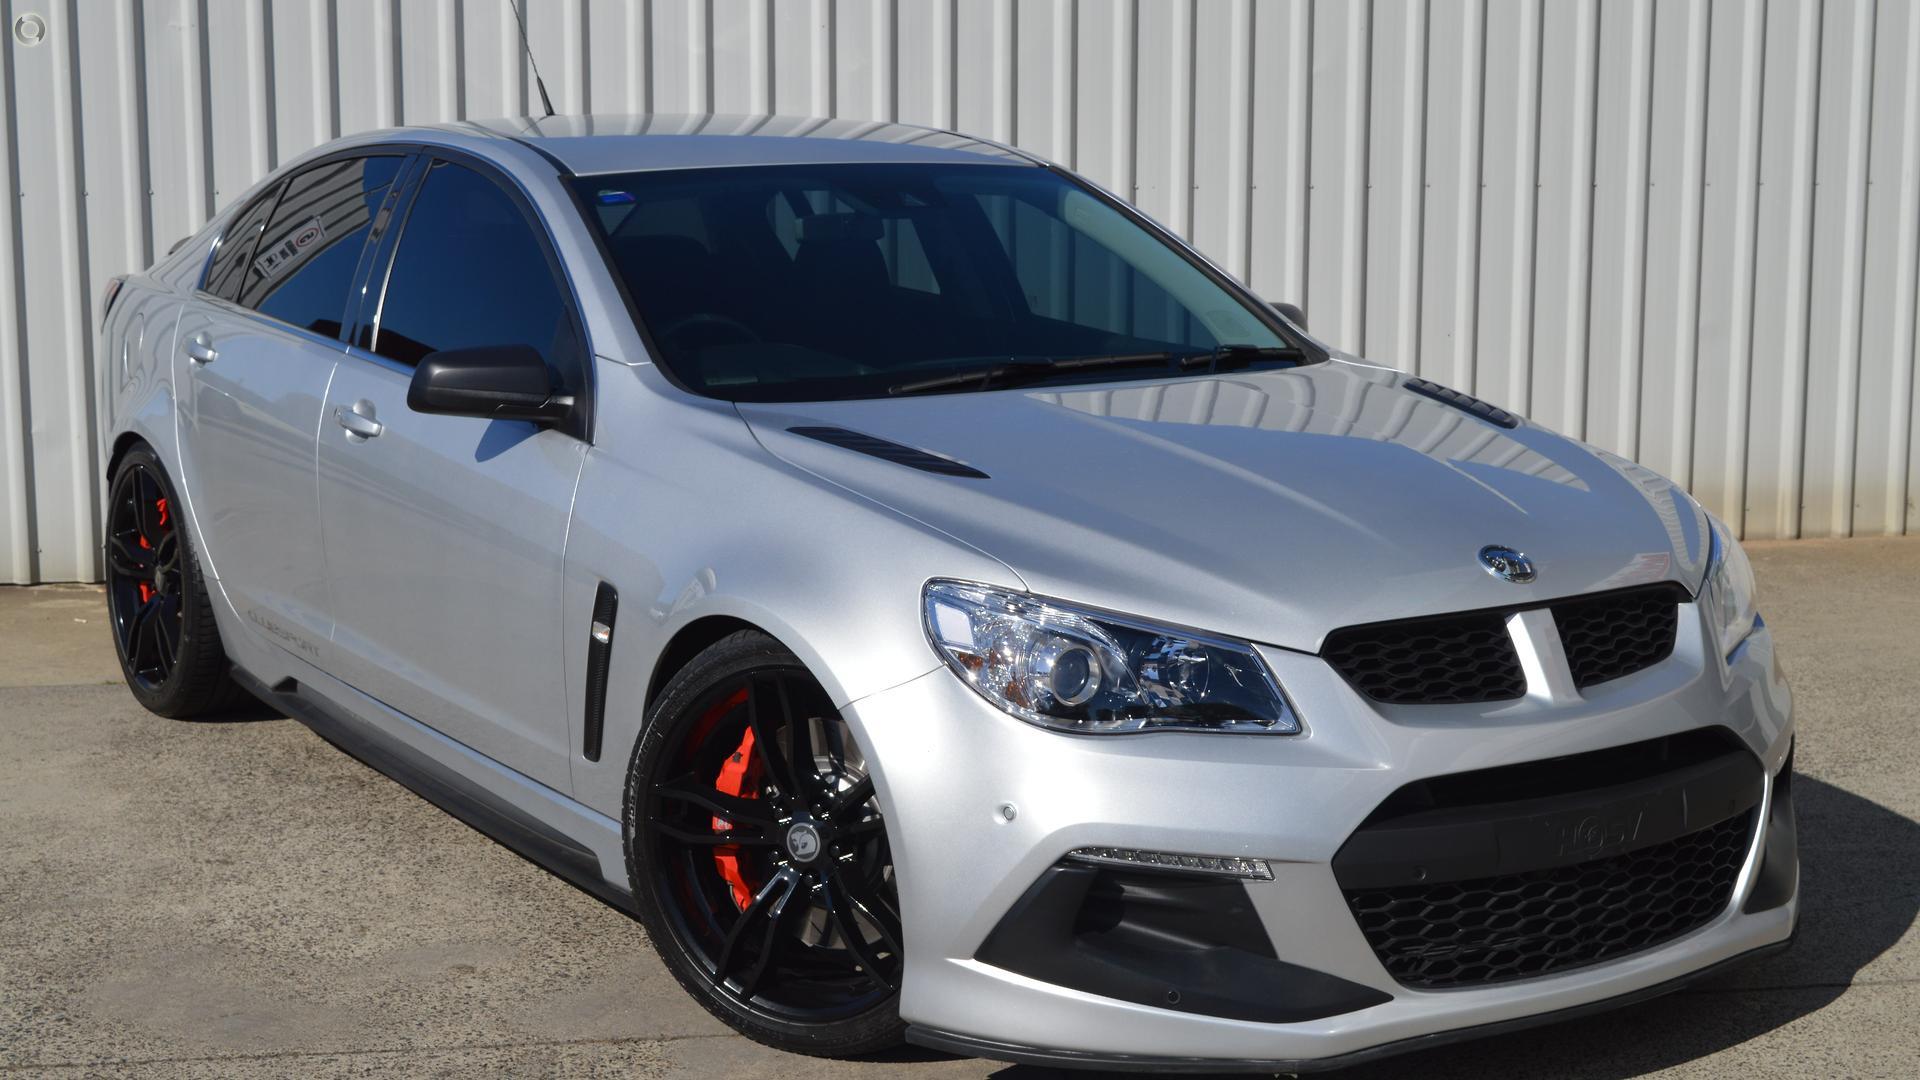 2016 Holden Special Vehicles Clubsport GEN-F2